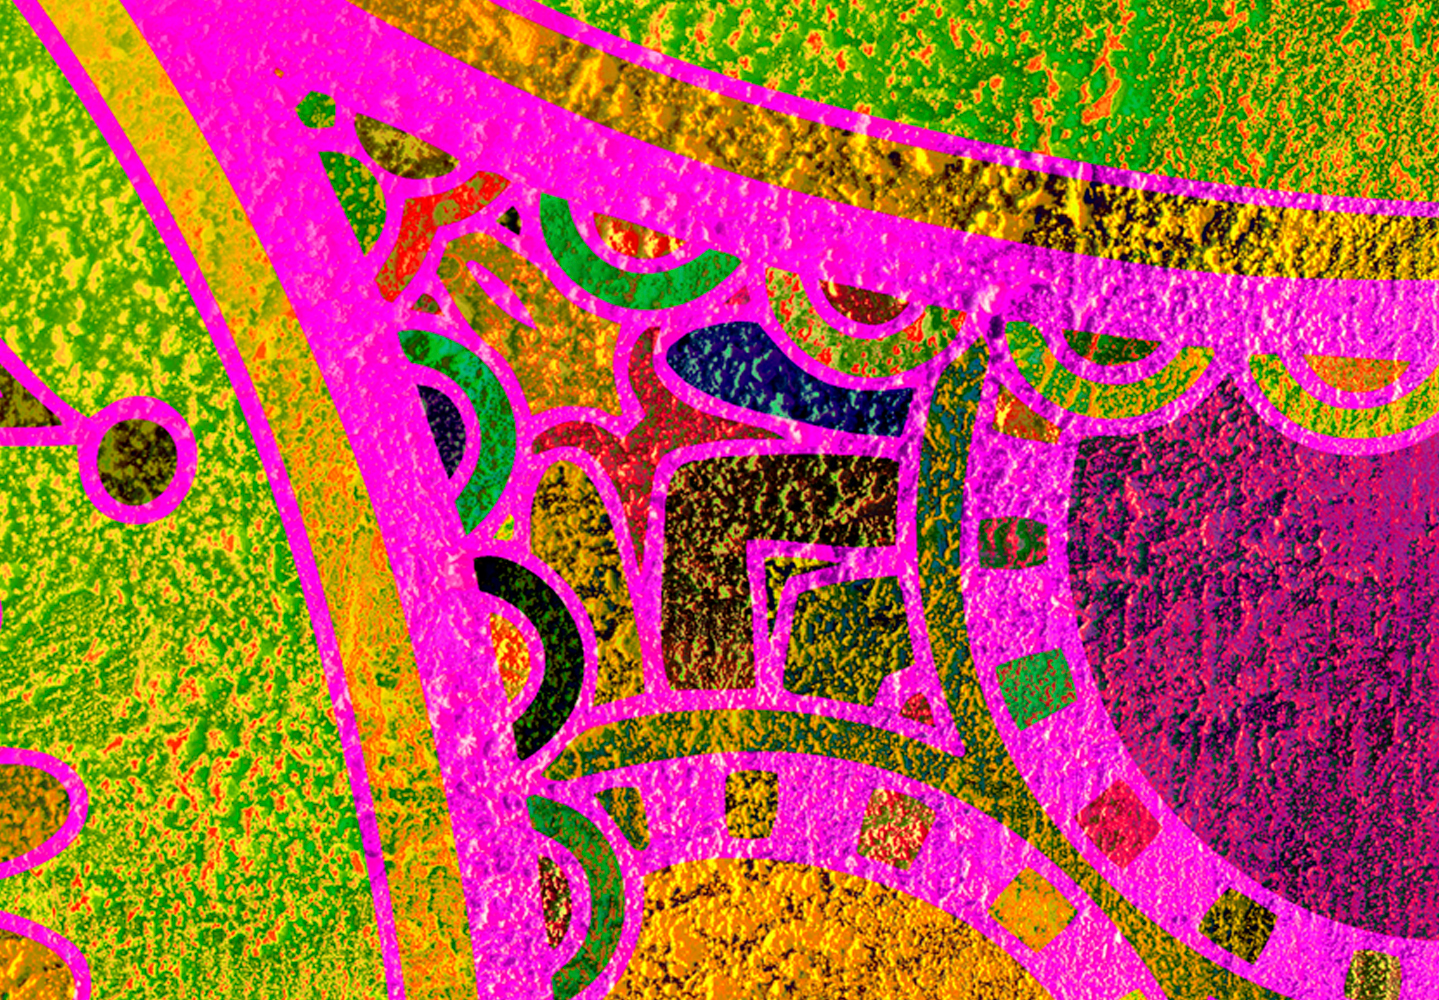 abstrakt mandala ethno bunt wandbilder xxl bilder vlies